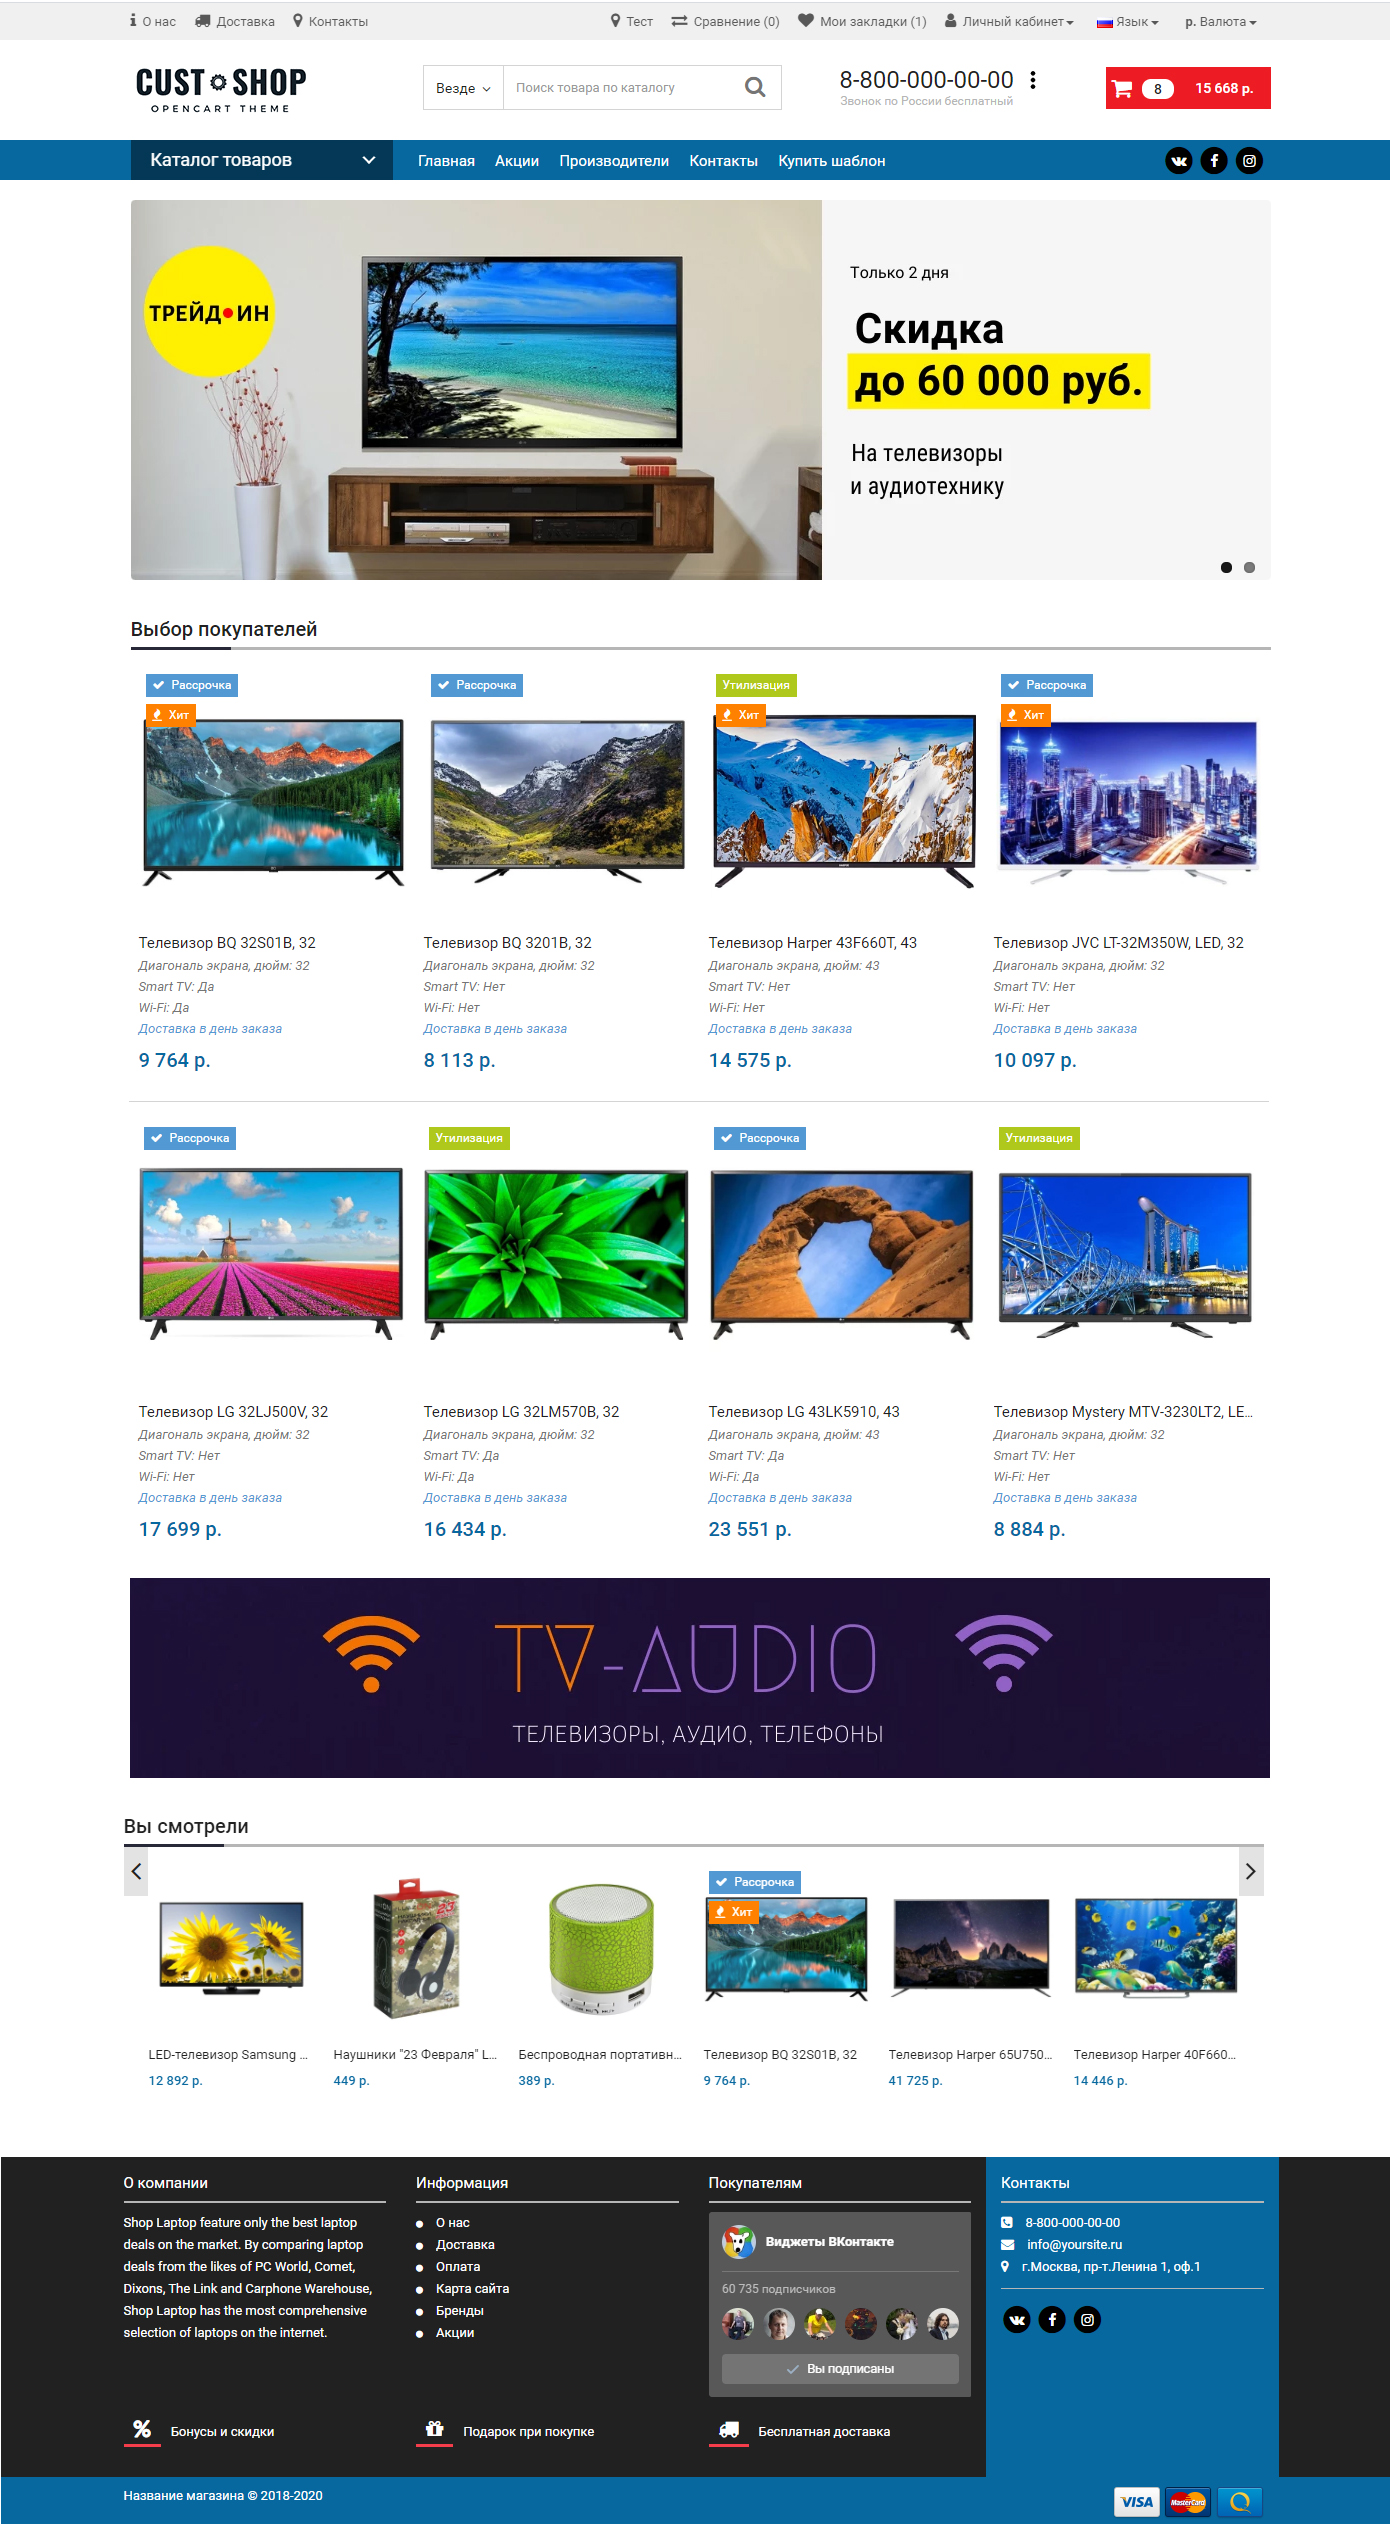 Пример шаблона - Интернет-магазин на базе Opencart